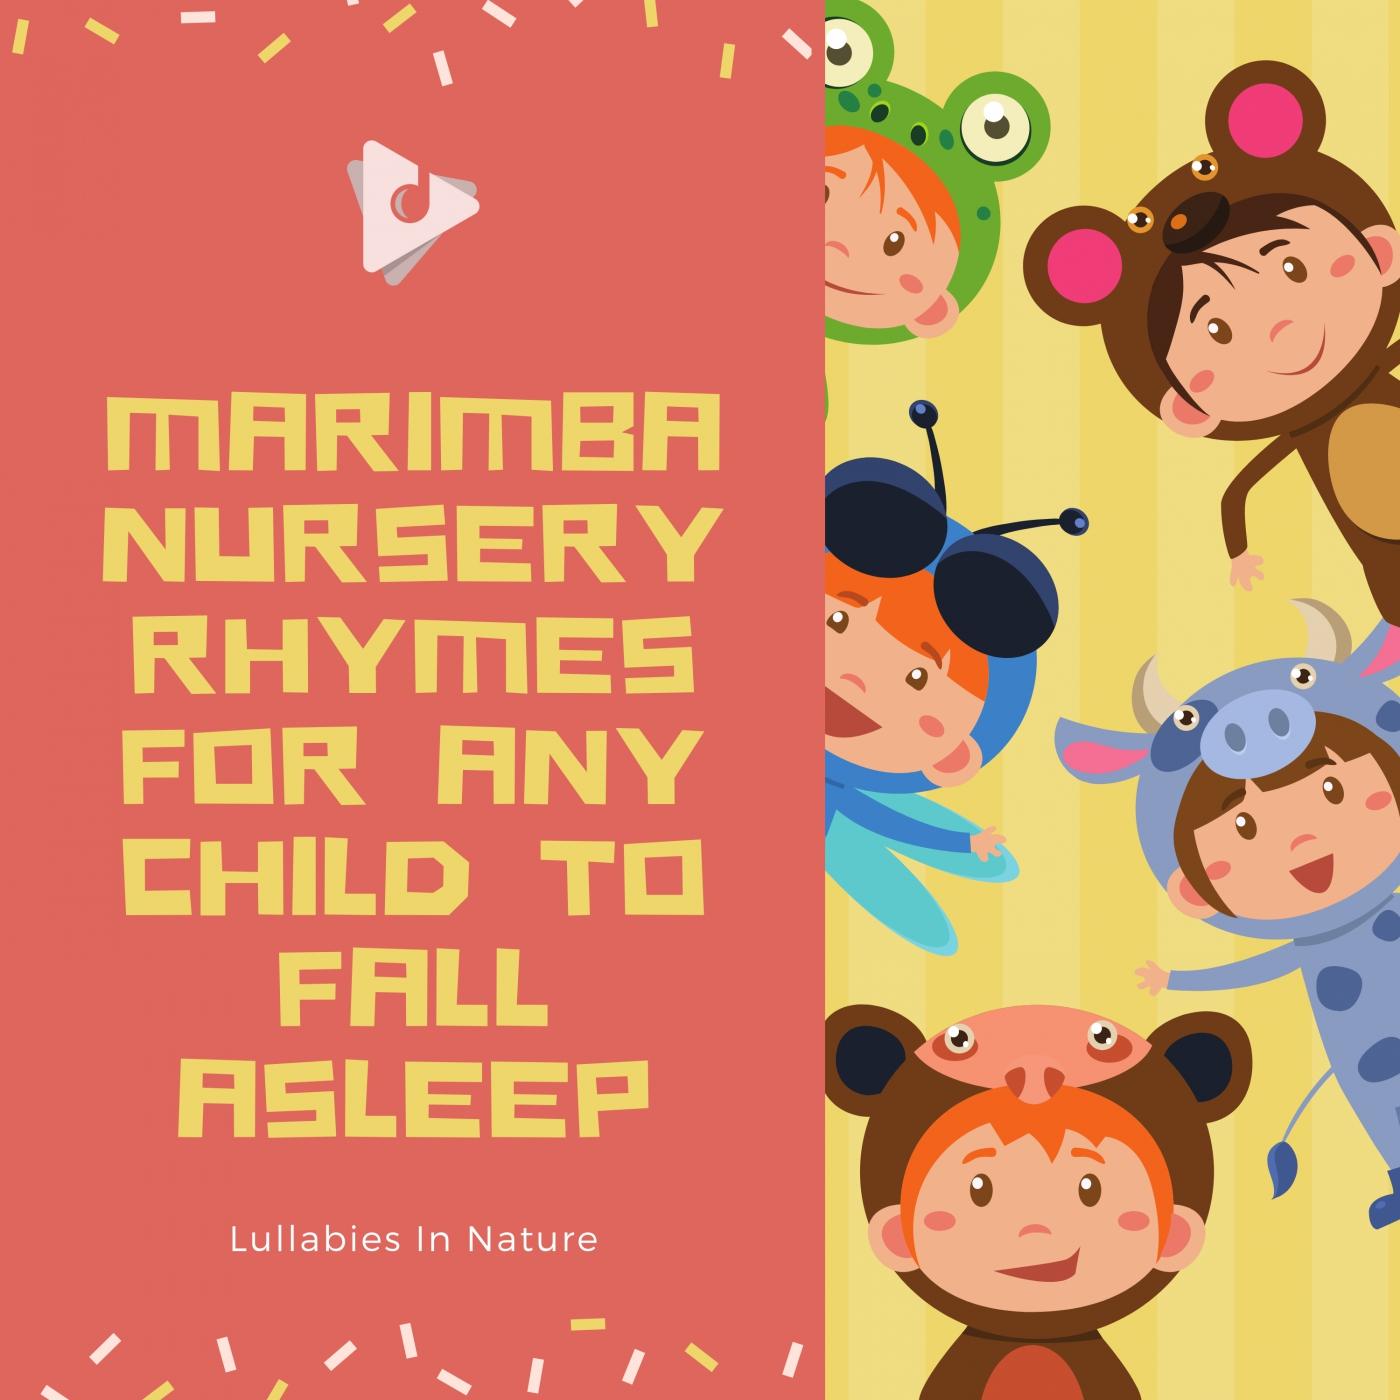 Marimba Nursery Rhymes for Any Child To Fall Asleep